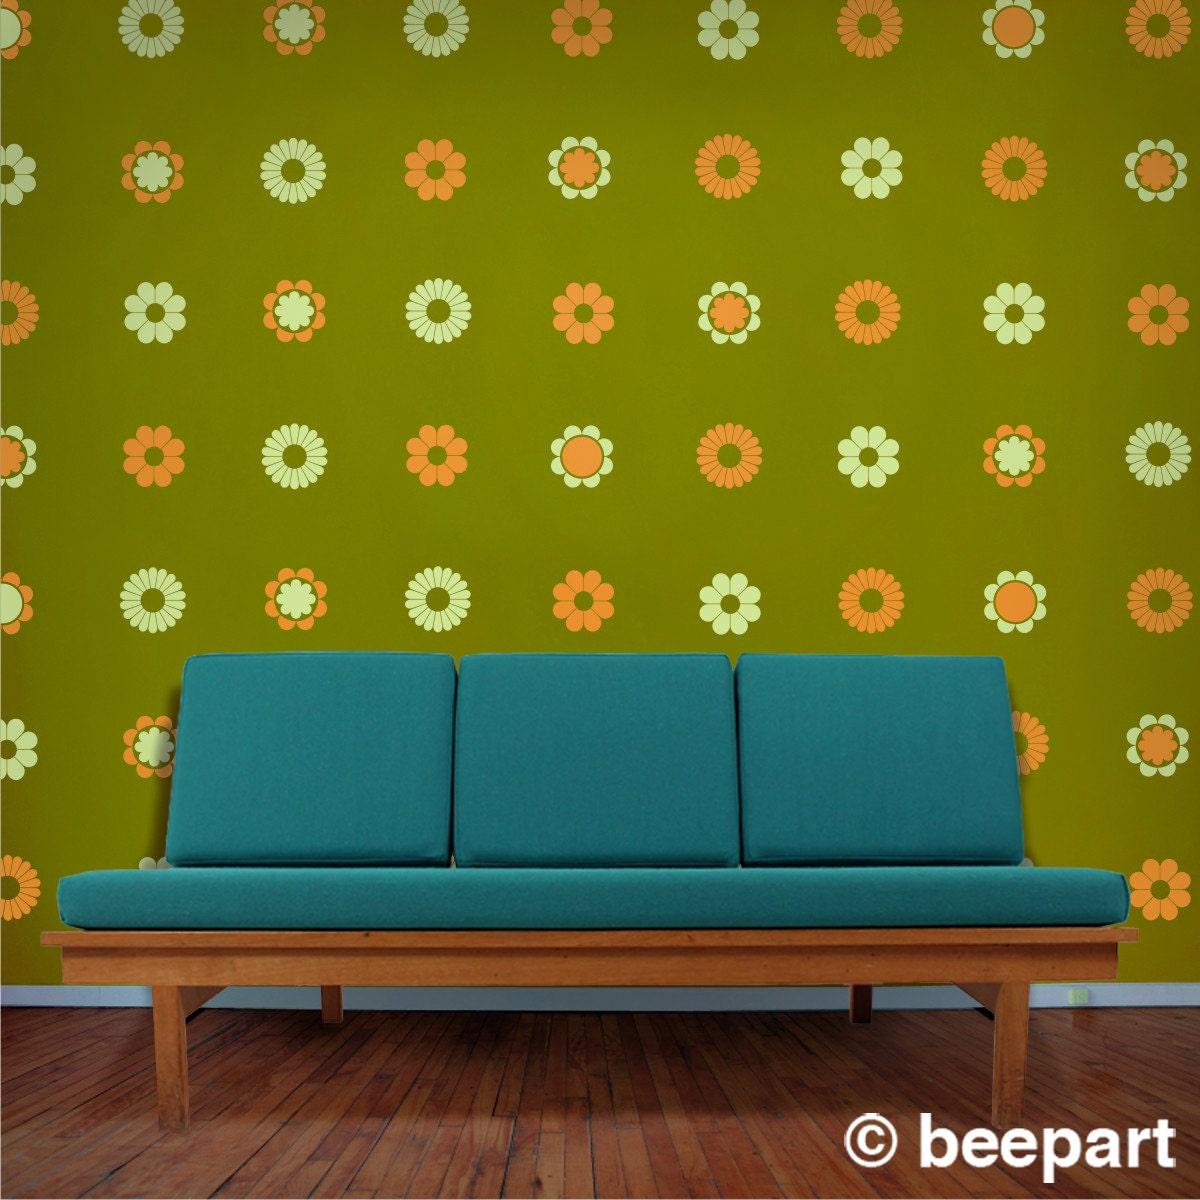 flower pattern vinyl wall decal set 70s funky flowers by beepart